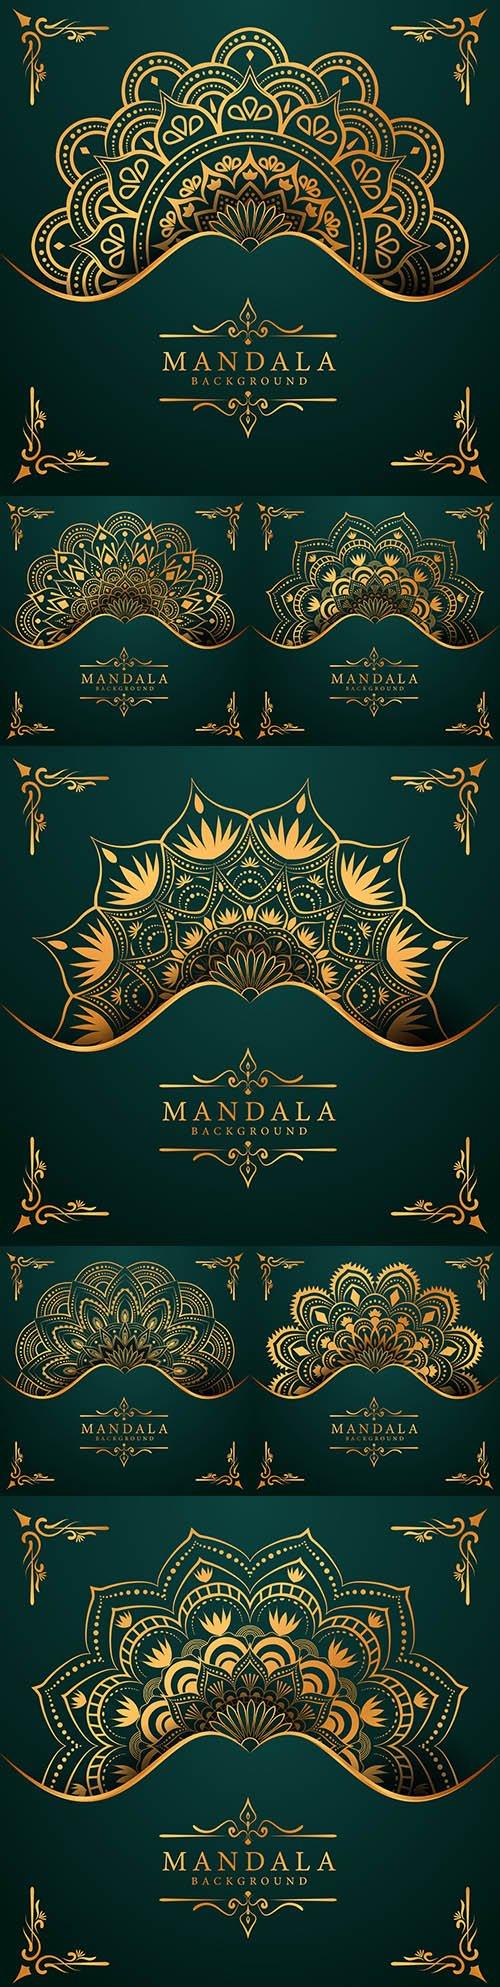 Modern abstract mandala background golden oriental style